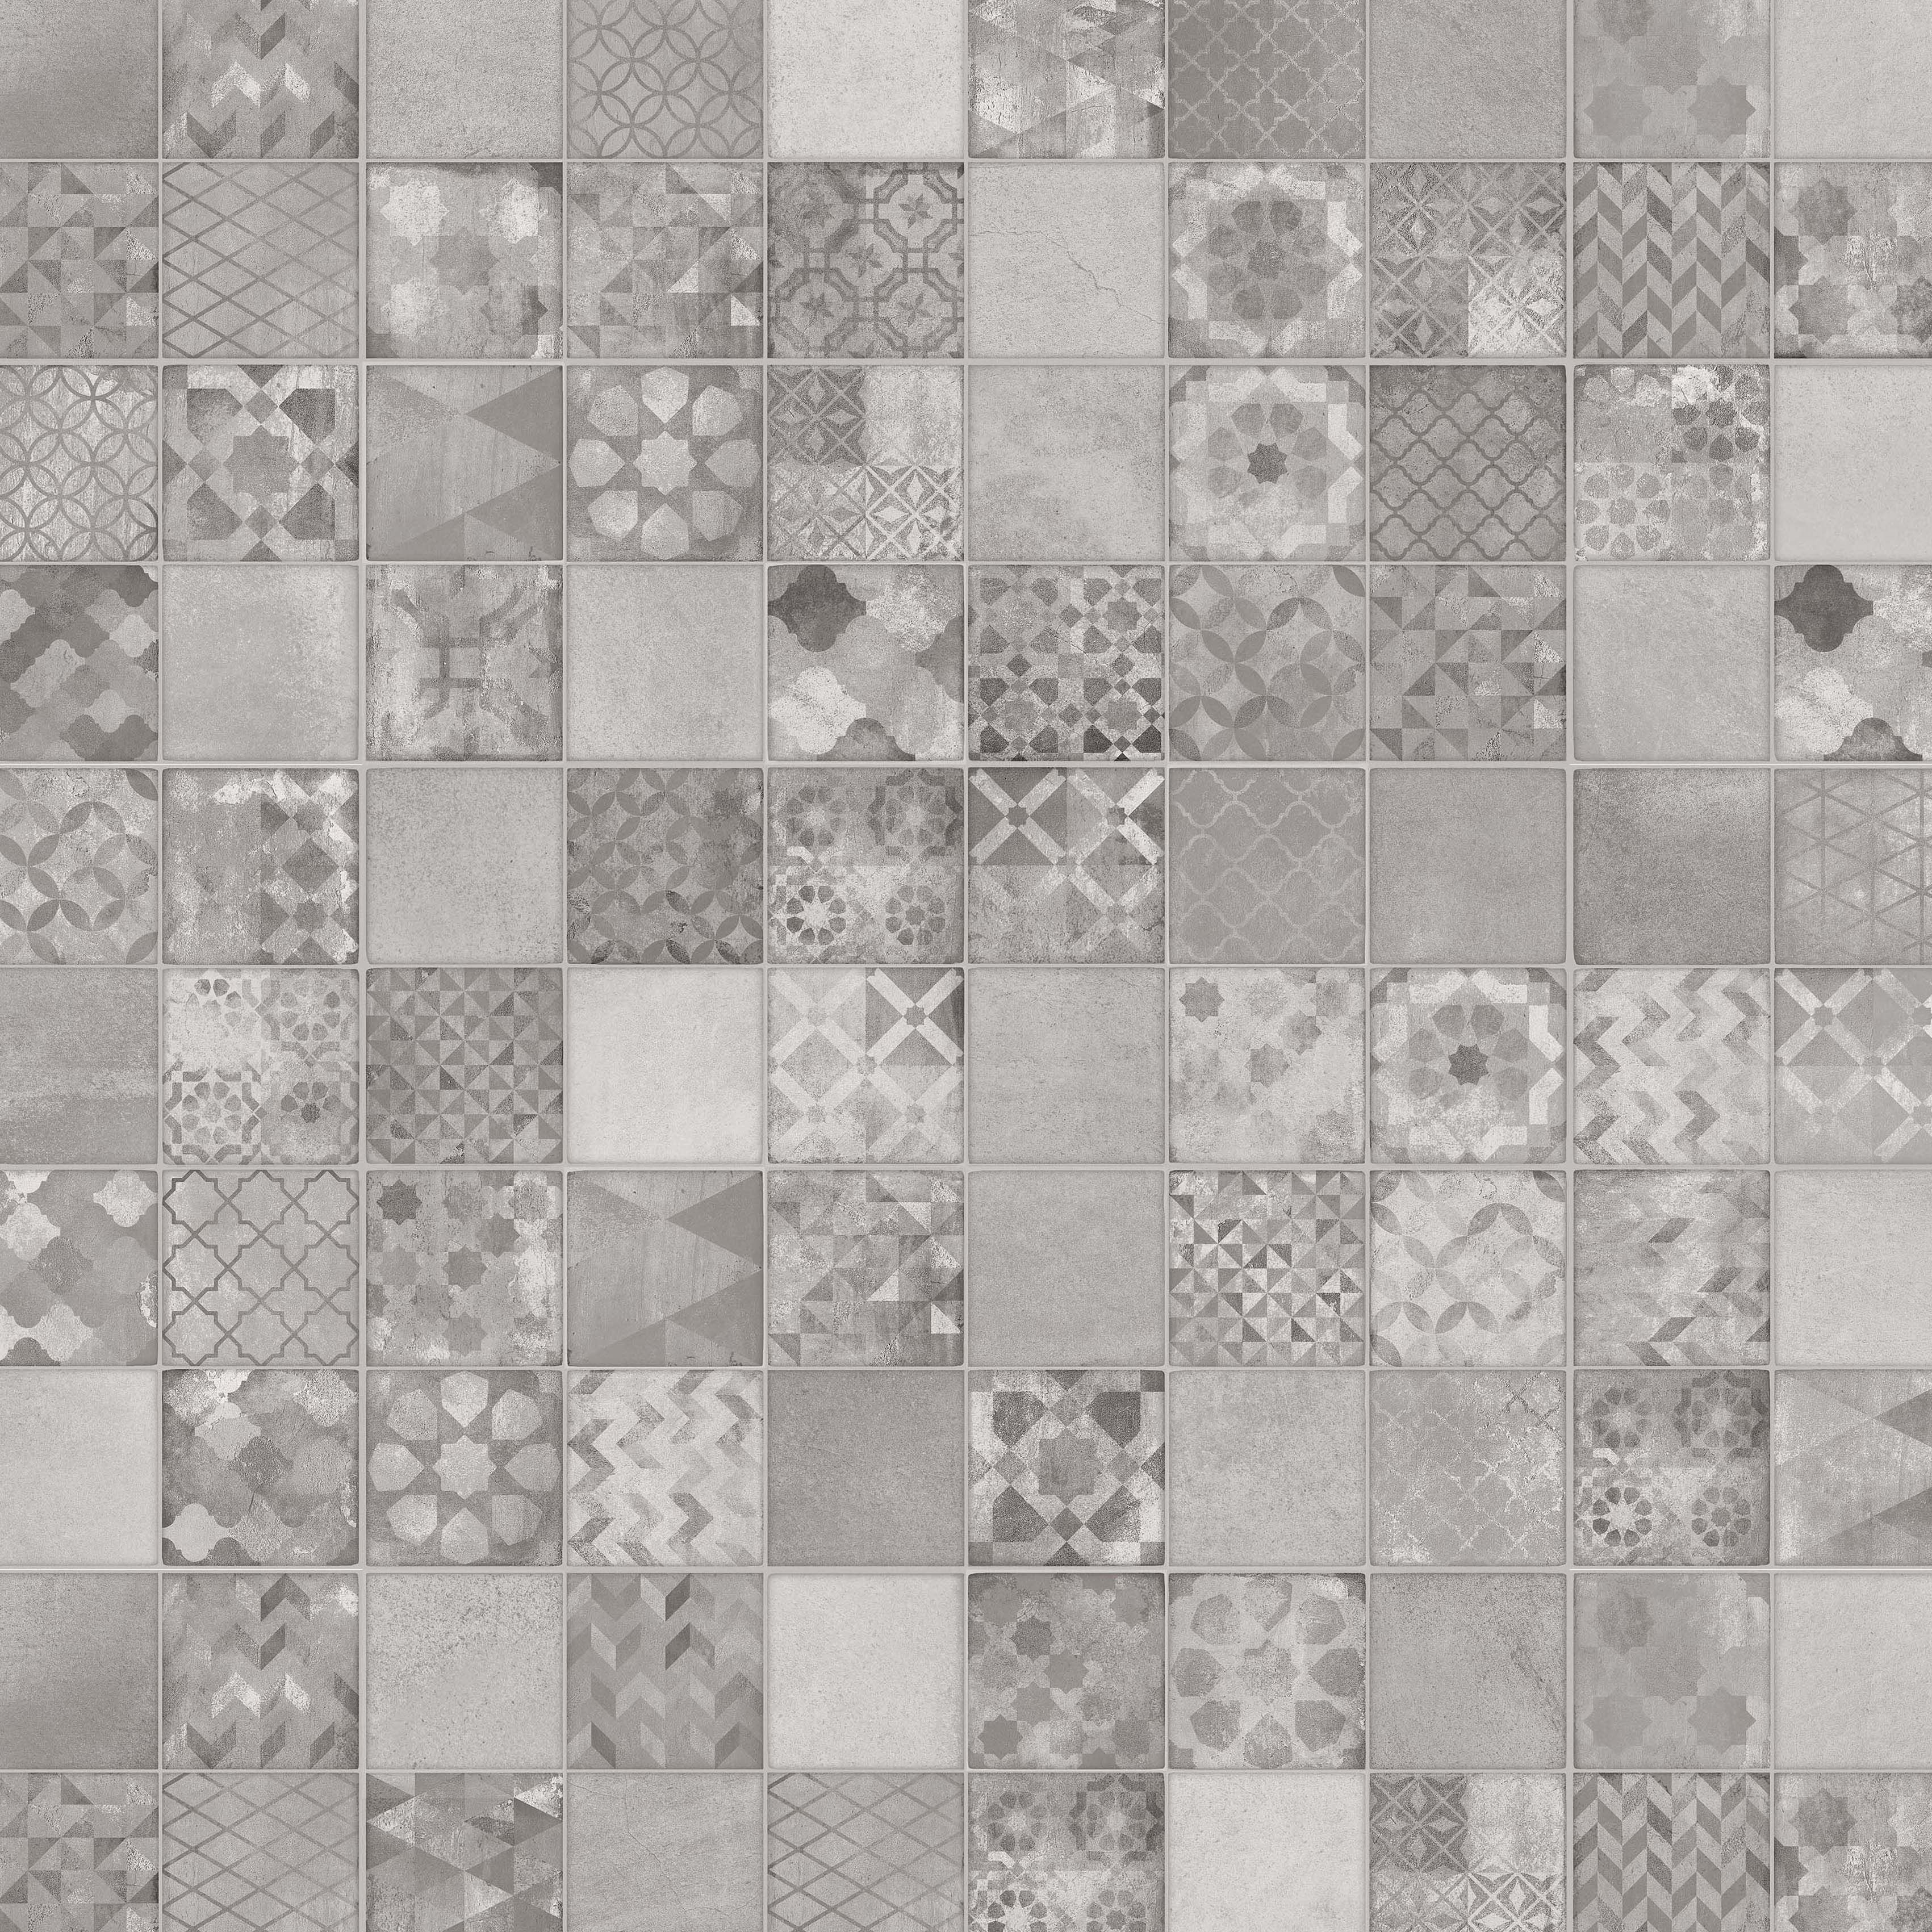 Vives wall tiles white body kent 25x75 new kitchen pinterest vives wall tiles white body kent 25x75 dailygadgetfo Images